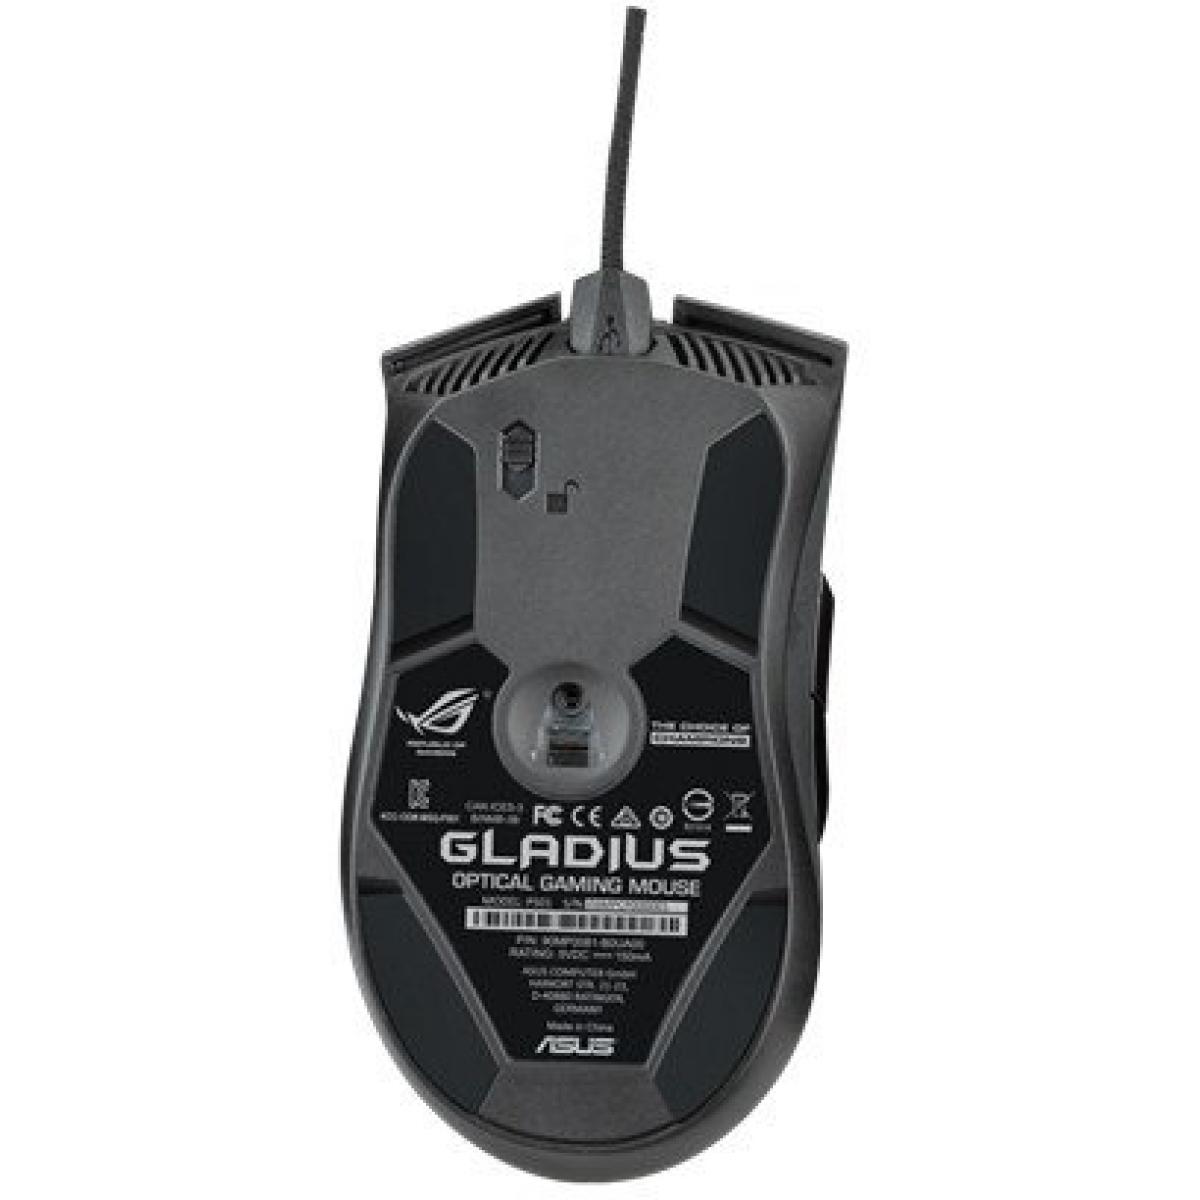 Mouse Gamer Asus Laser Rog Gladius 6400 DPI 2 Botões Programáveis Preto